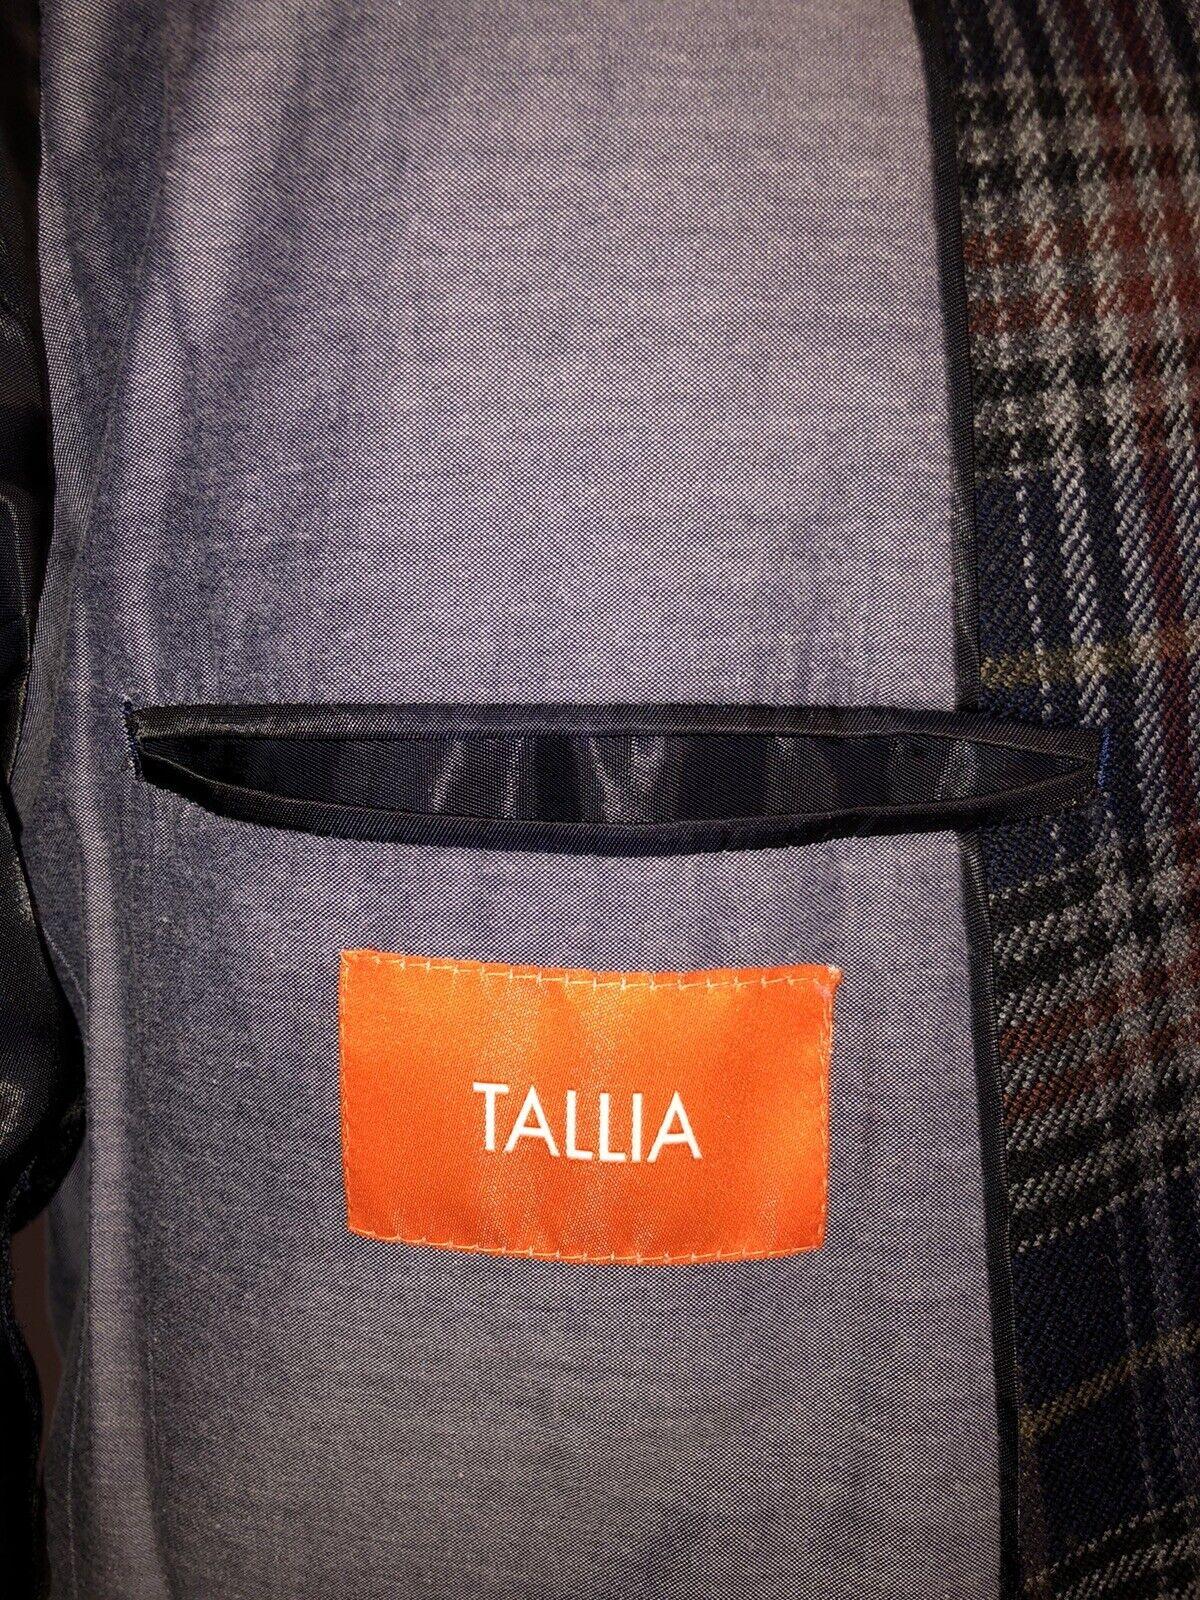 Tallia Blue Multi Color Sport Coat Jacket 42R - image 7